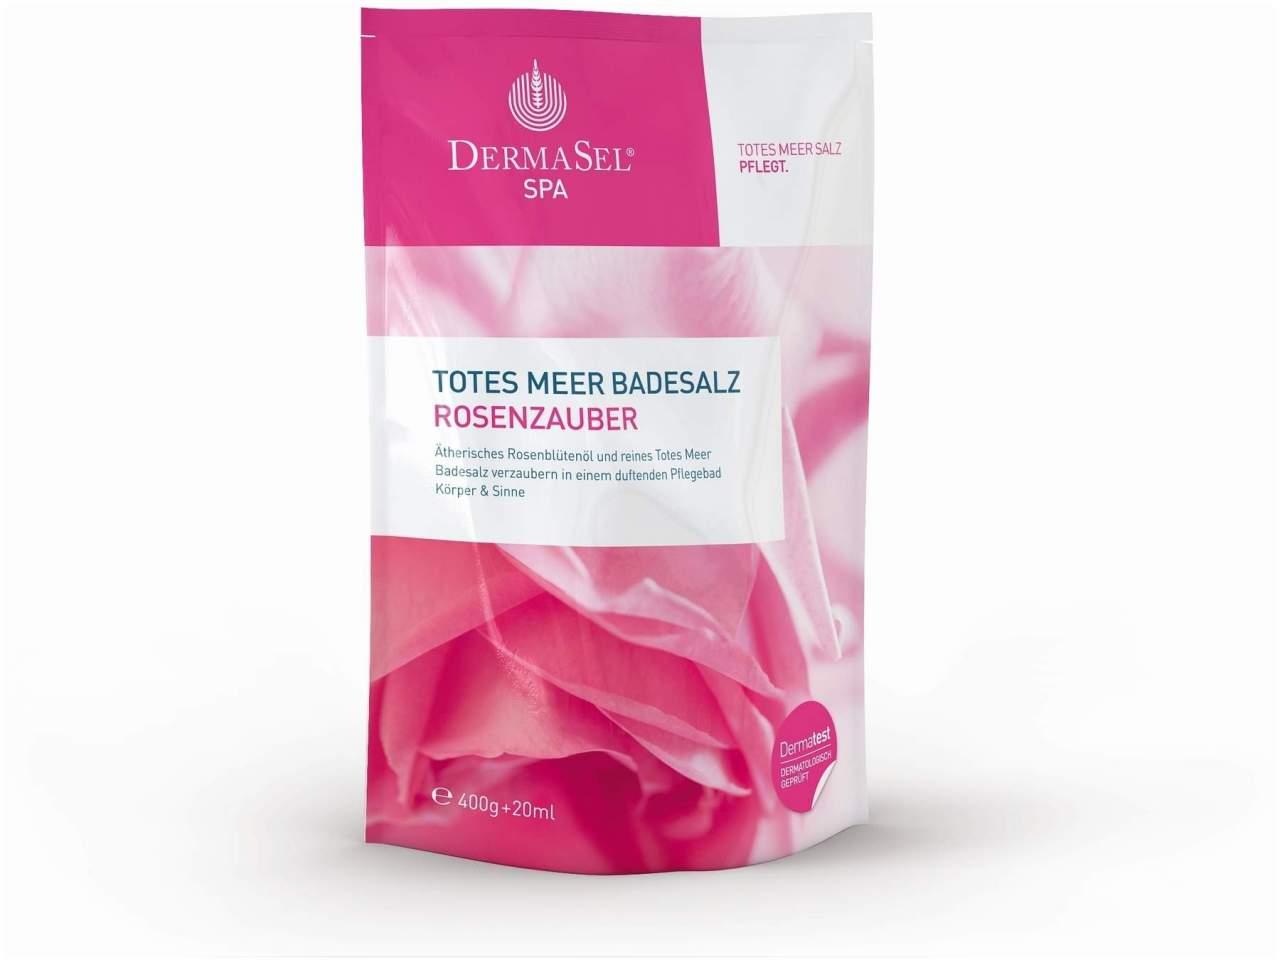 Totes Meer Badesalz und Rosenöl Bad Blütenzaube...